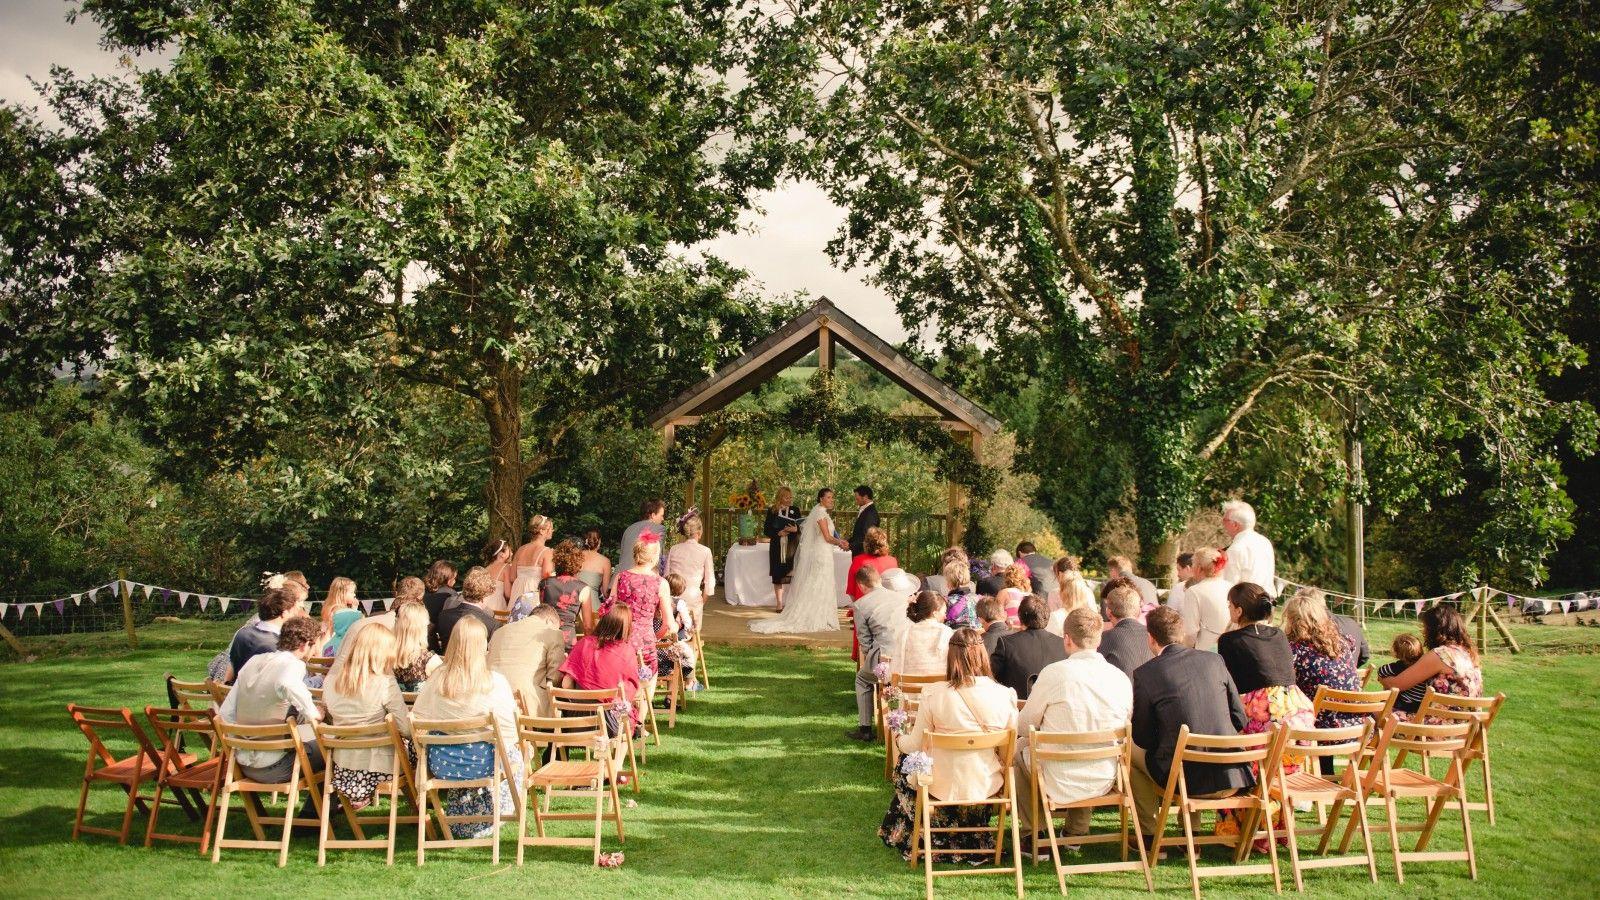 Orchard House Weddings Kate Toms The Big Cottage Company Cornish Wedding Venue